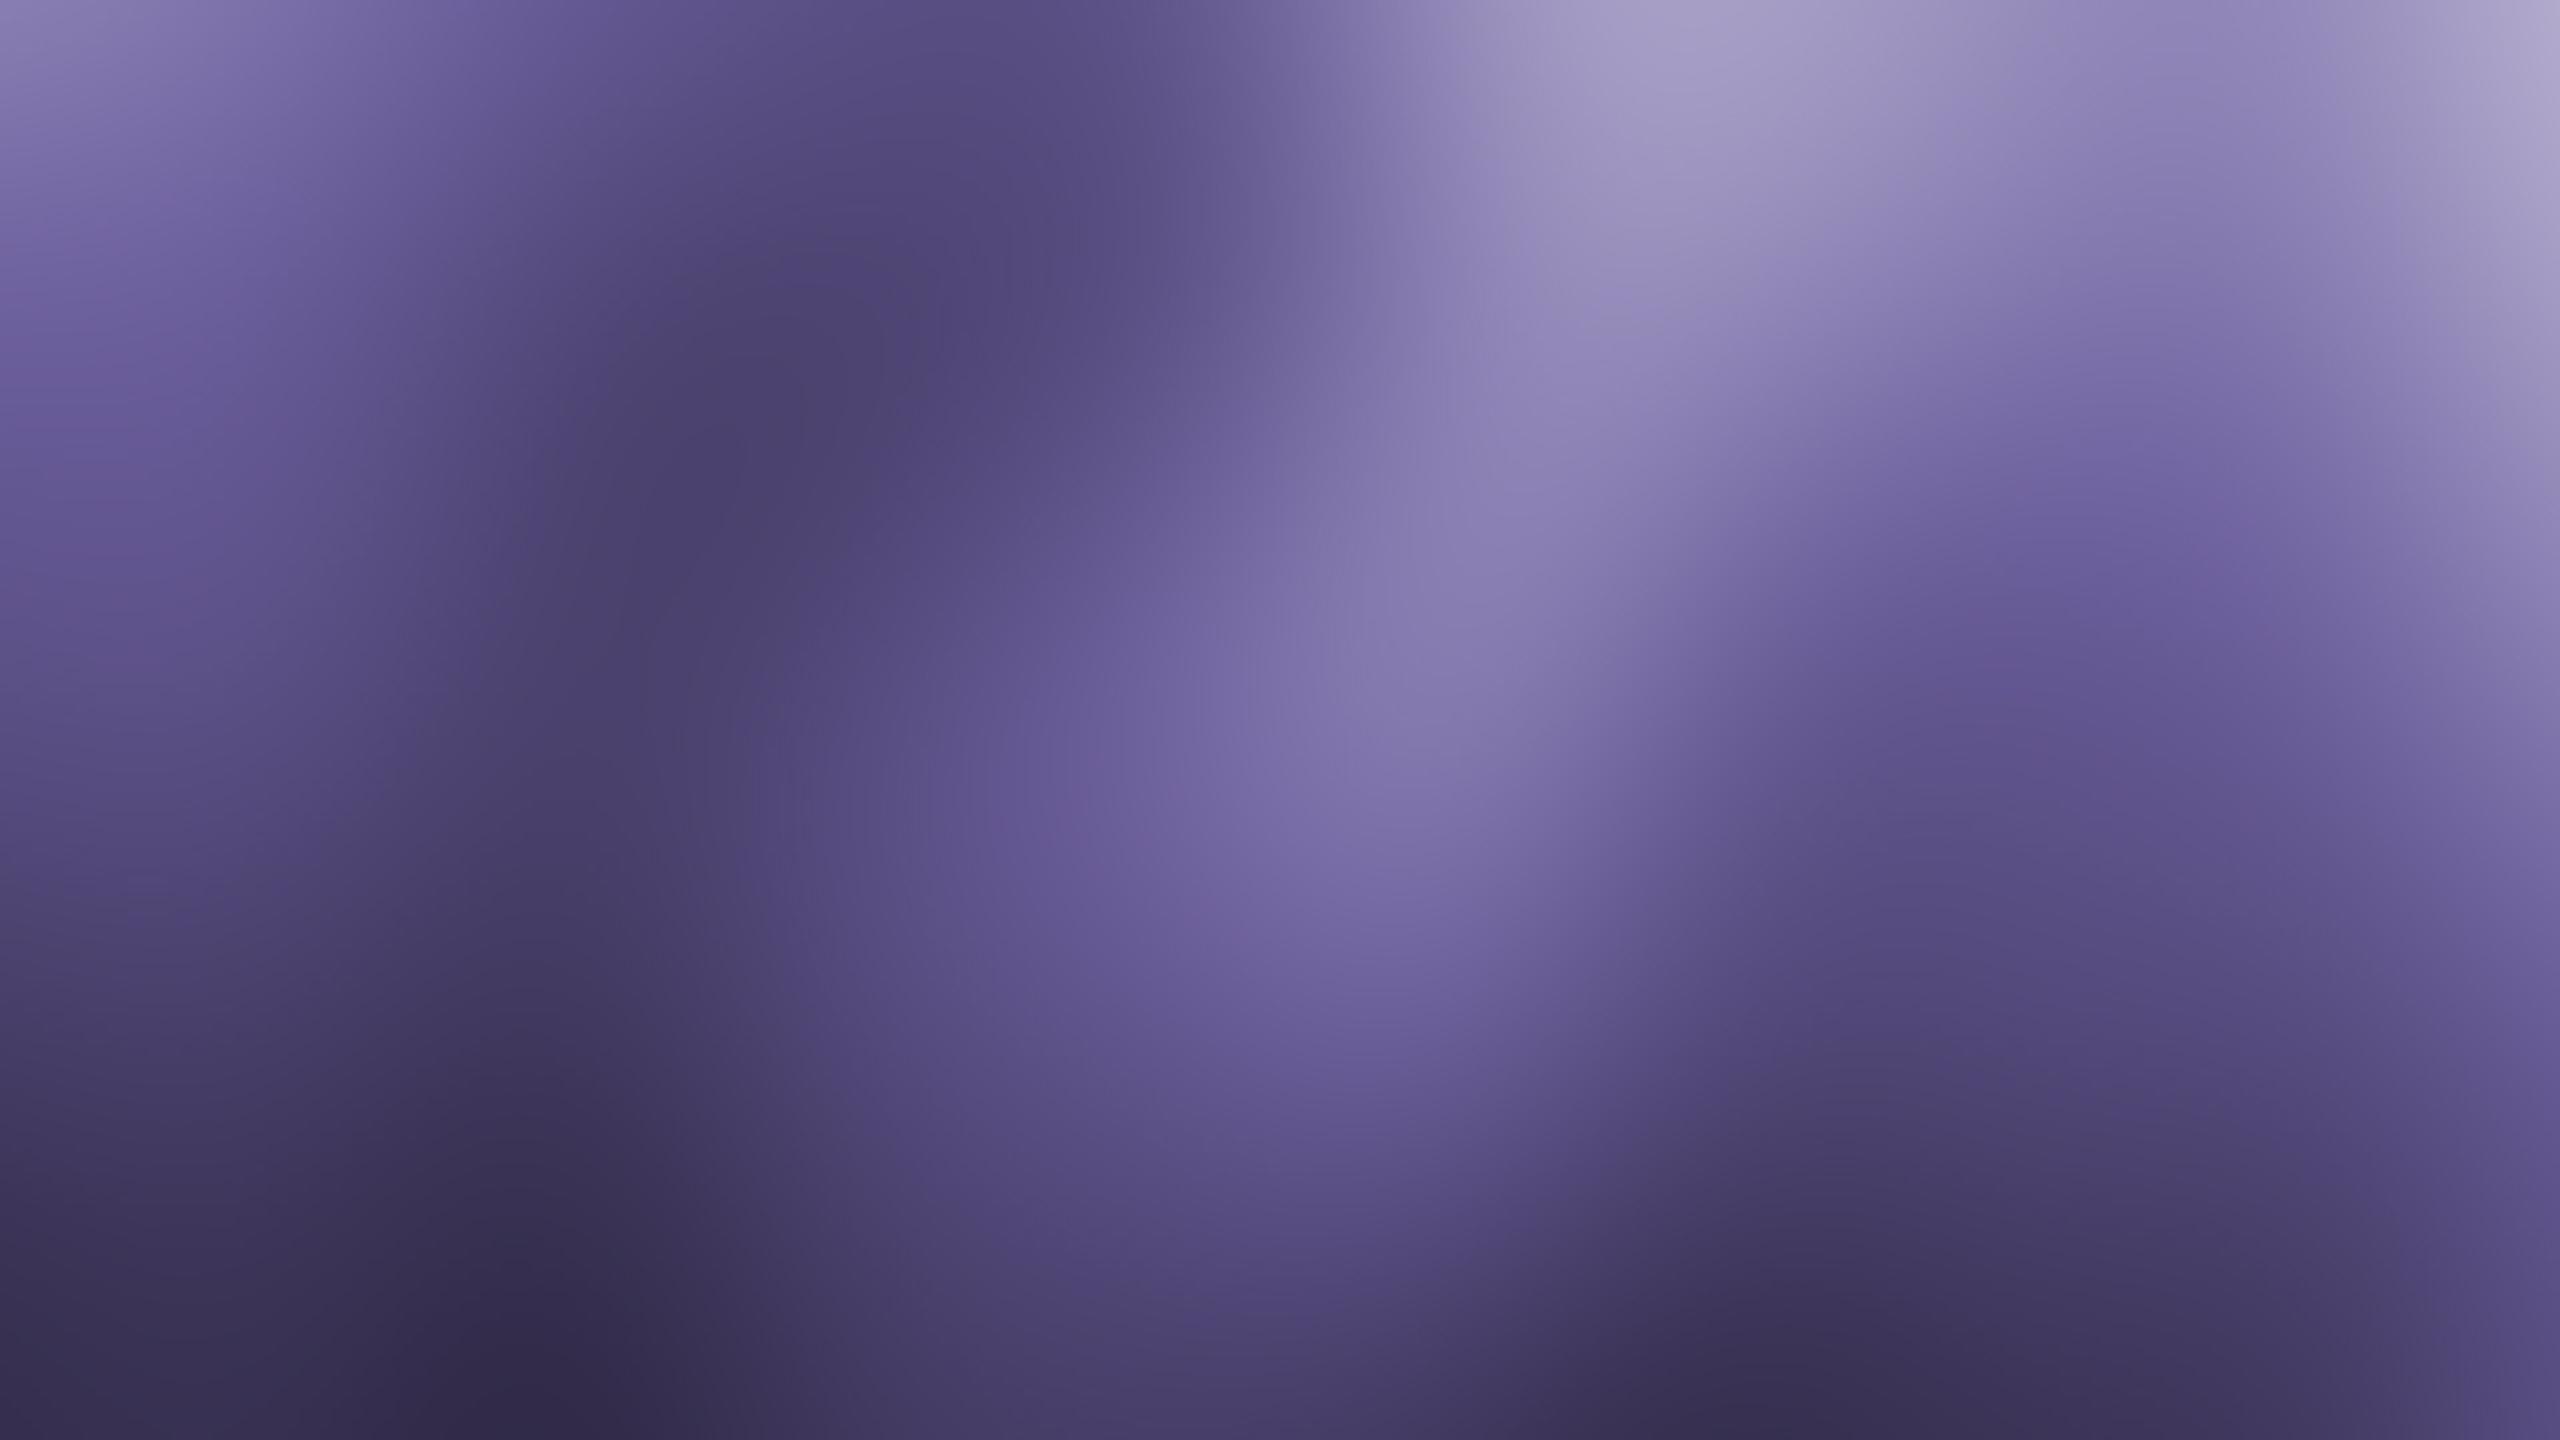 purple black background spot full hd wallpaper